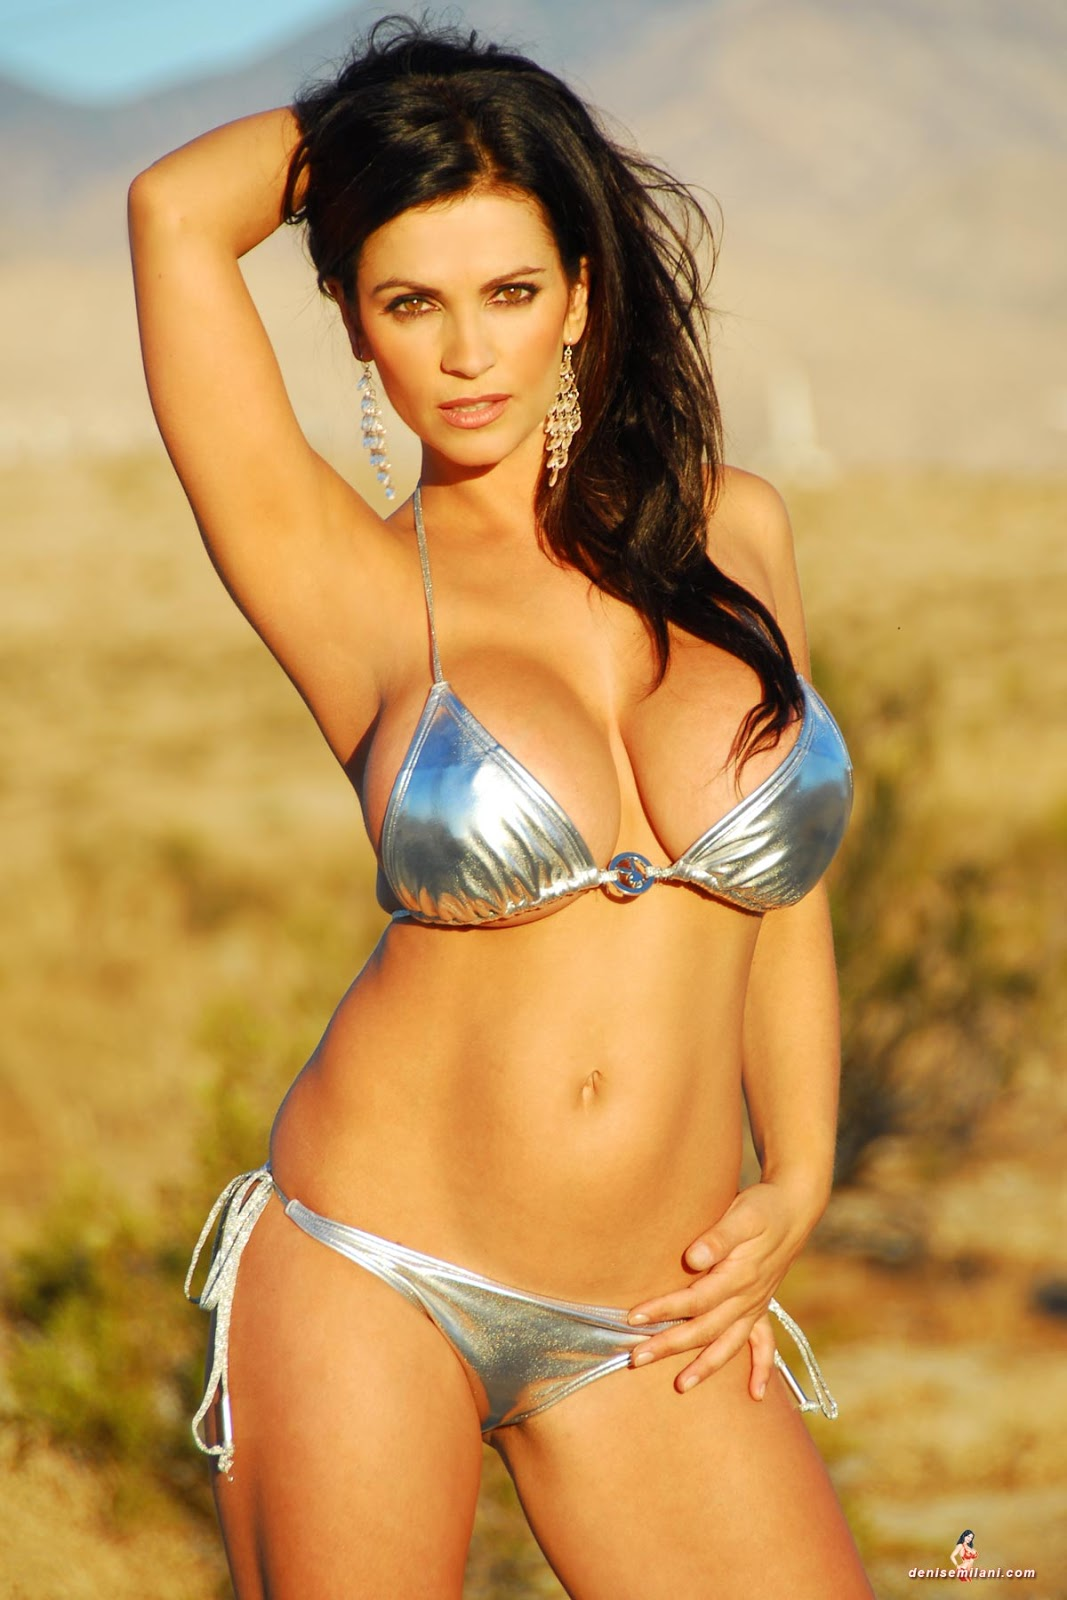 Denise Milani Sexiest Photoshoots: Denise Milani: Silver Sun